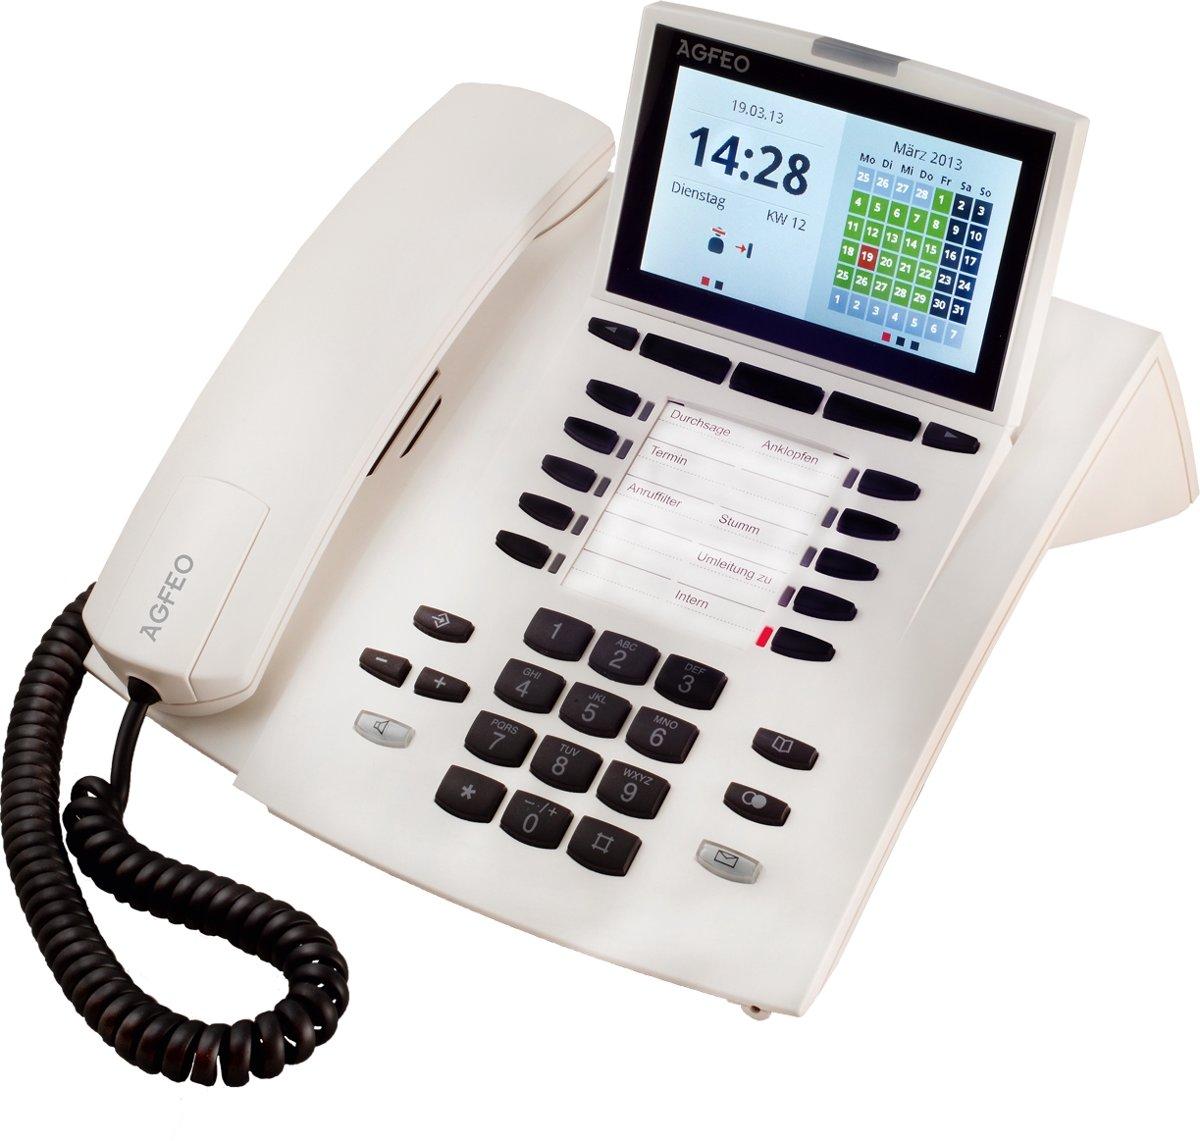 AGFEO ST45 IP - VoIP telefoon - Wit